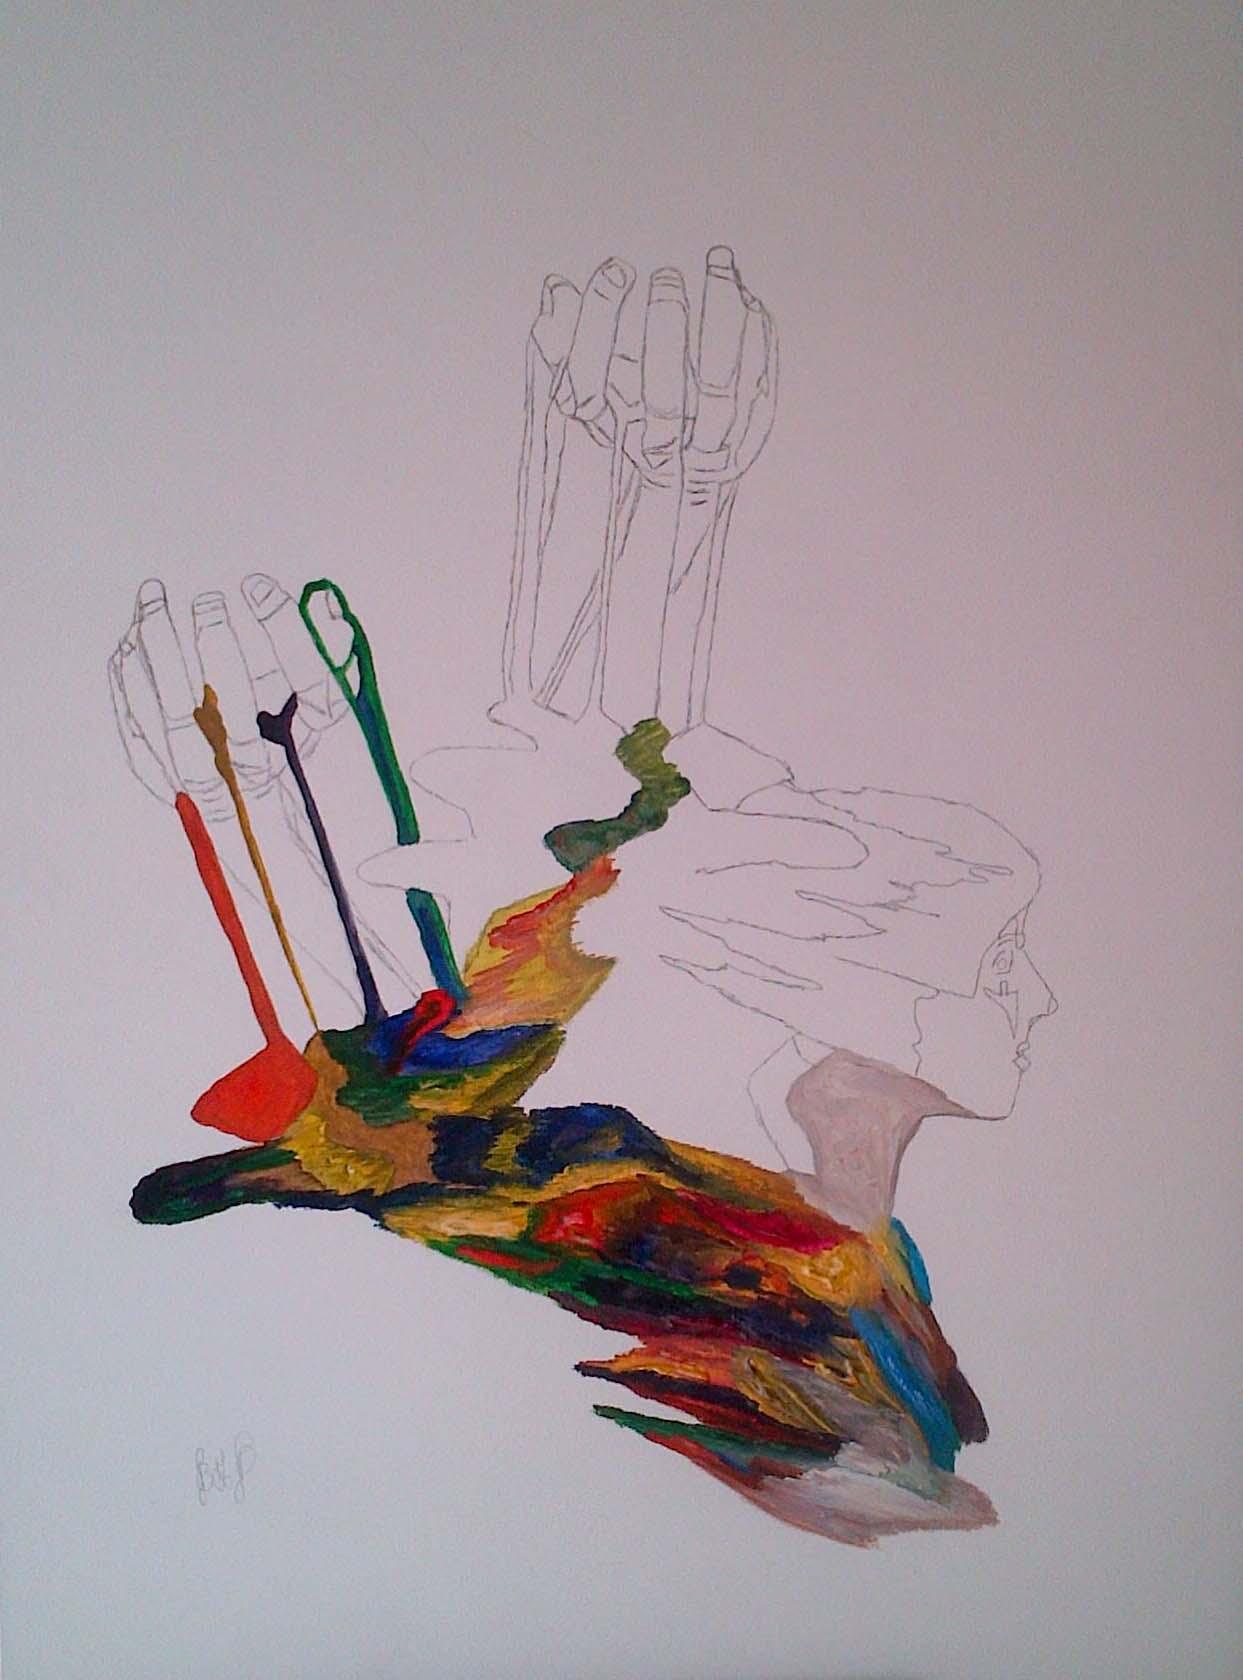 bd-aquarelle-n-855-artiste-1